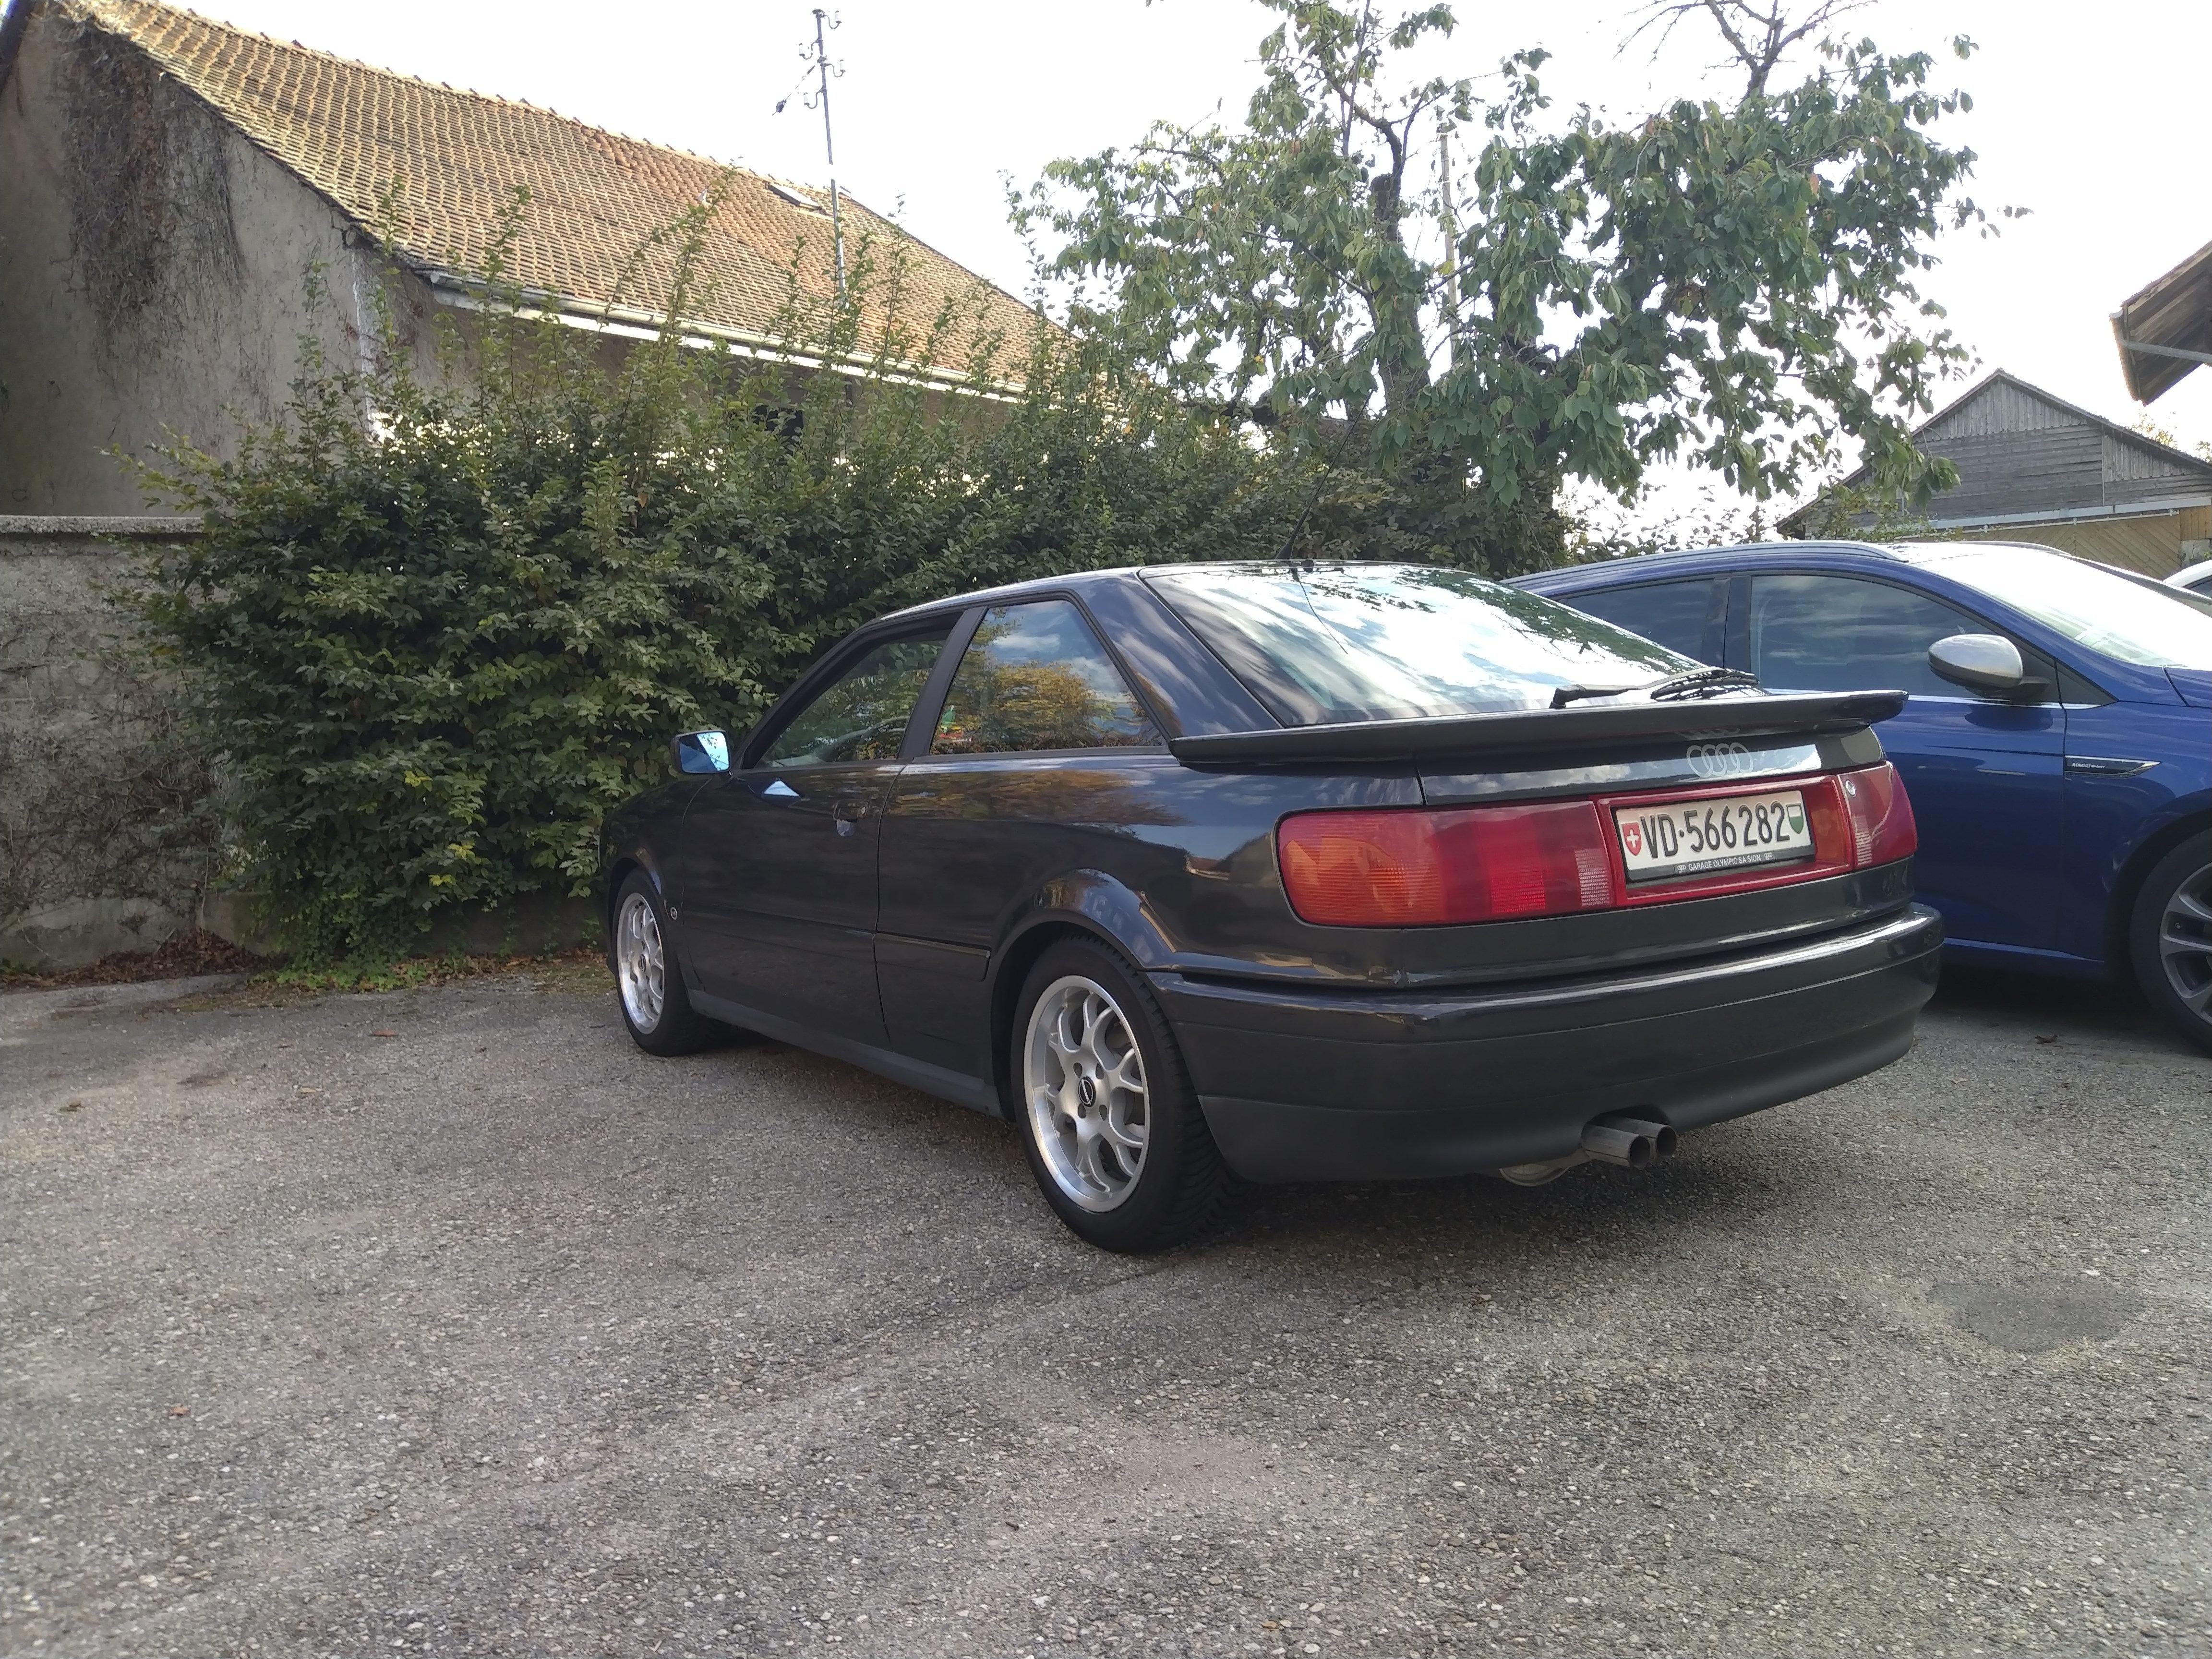 Pneu D Hiver A Vendre >> [Vends] - Audi Coupe V6 A Vendre - PA :: 80 / 90 / Coupé ...